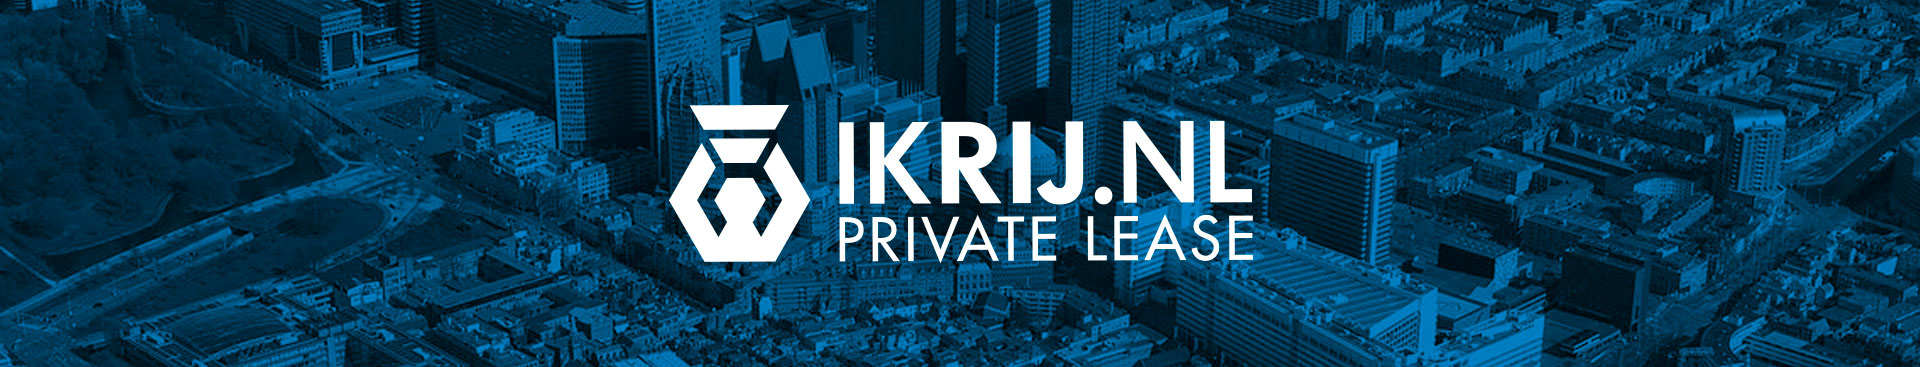 De beste private lease in Amersfoort komt van IKRIJ.NL